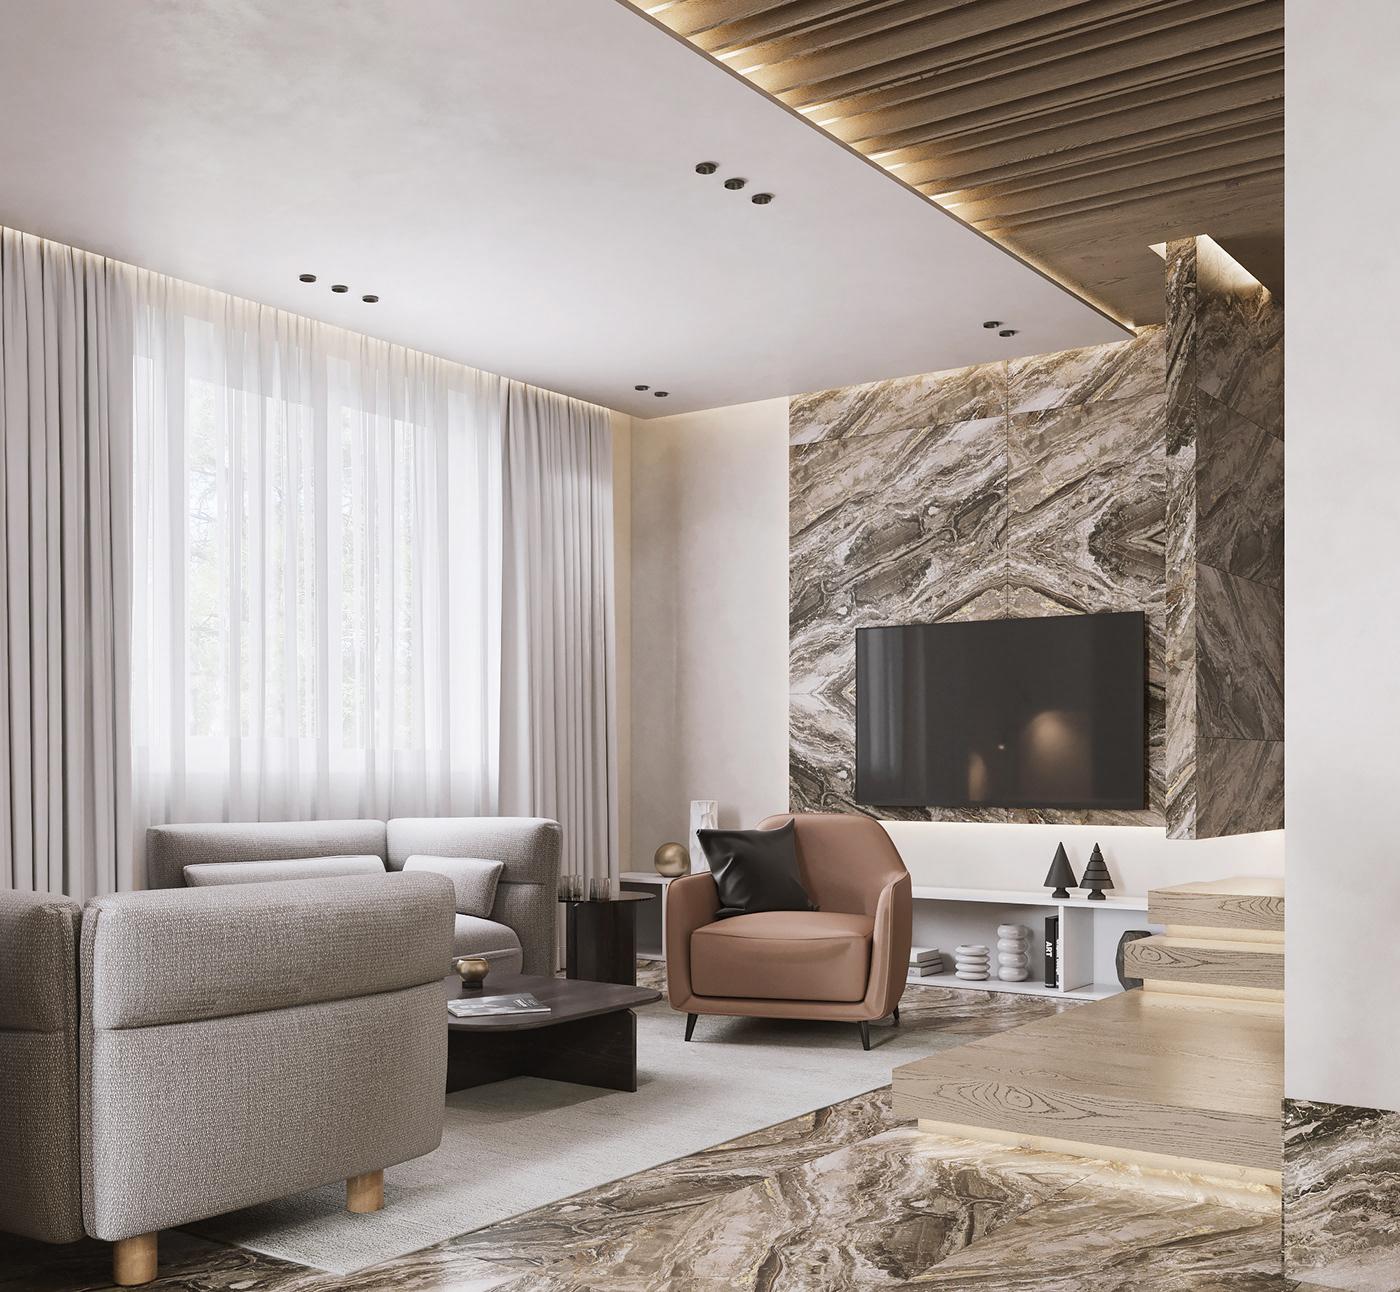 3dsmax CG corona Interior Minimalism Render Townhouse visualization